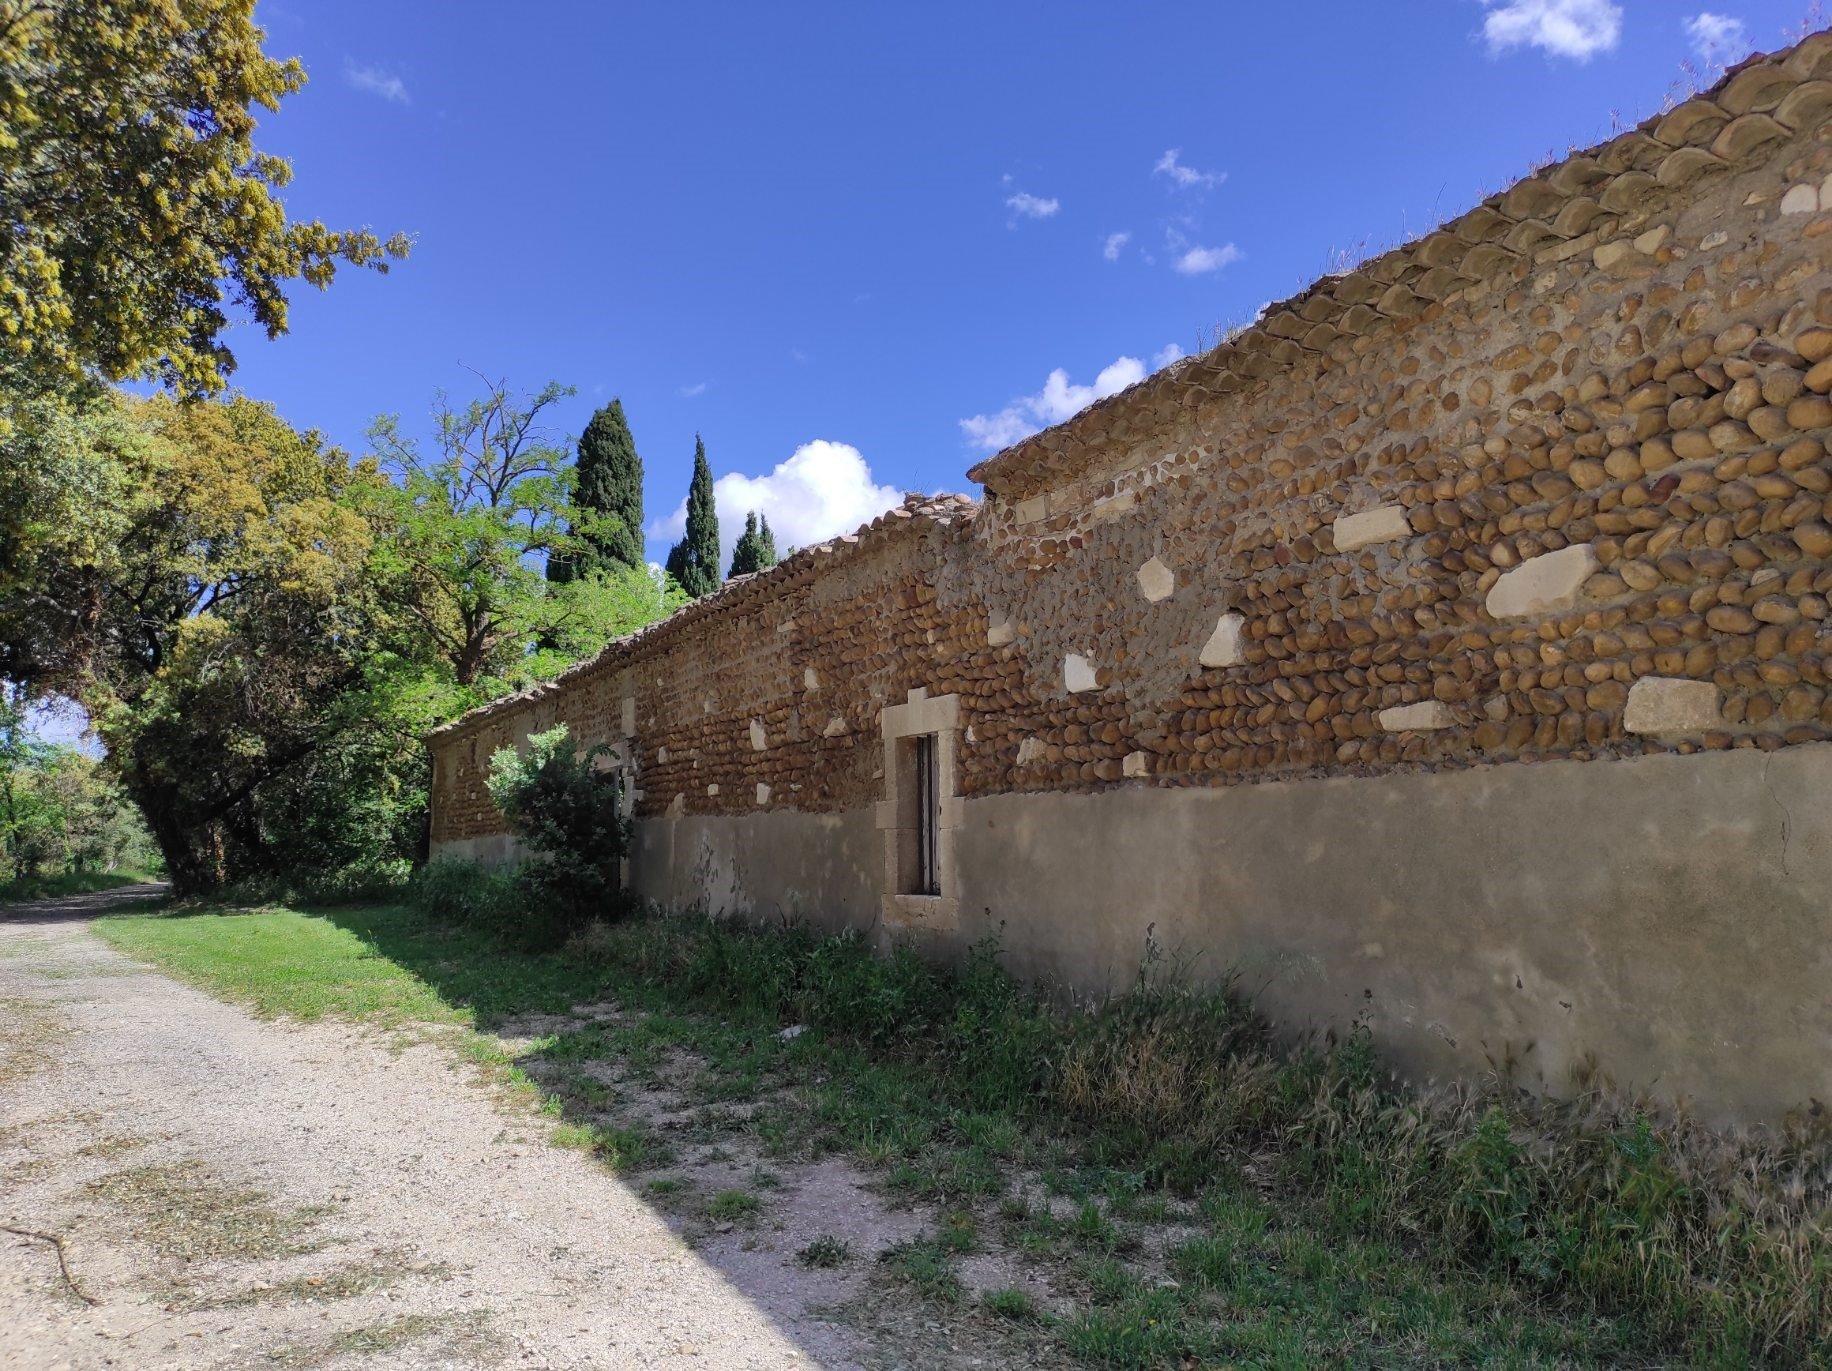 Sale Mas - Saint-Martin-de-Crau